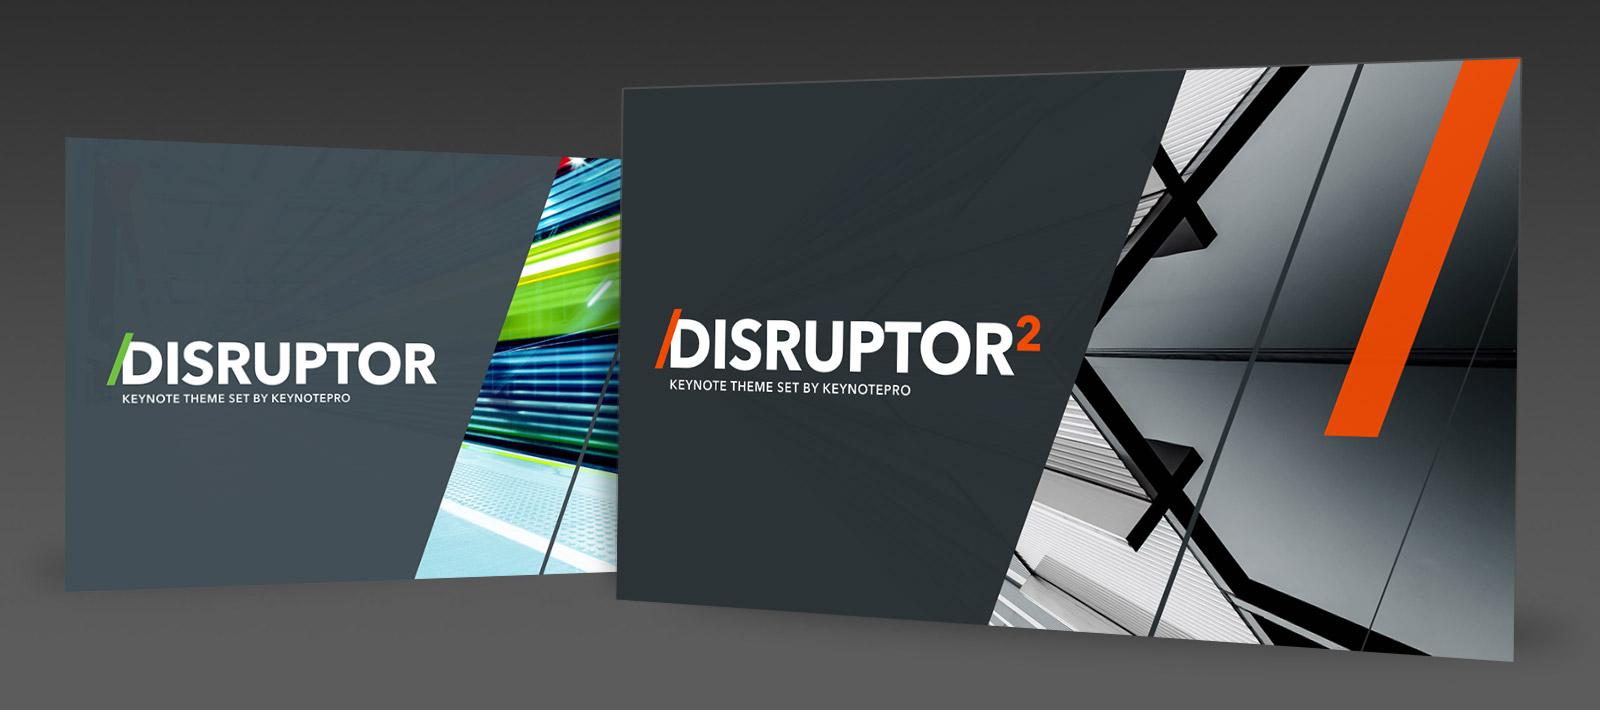 keynotepro keynote themes disruptor nxt